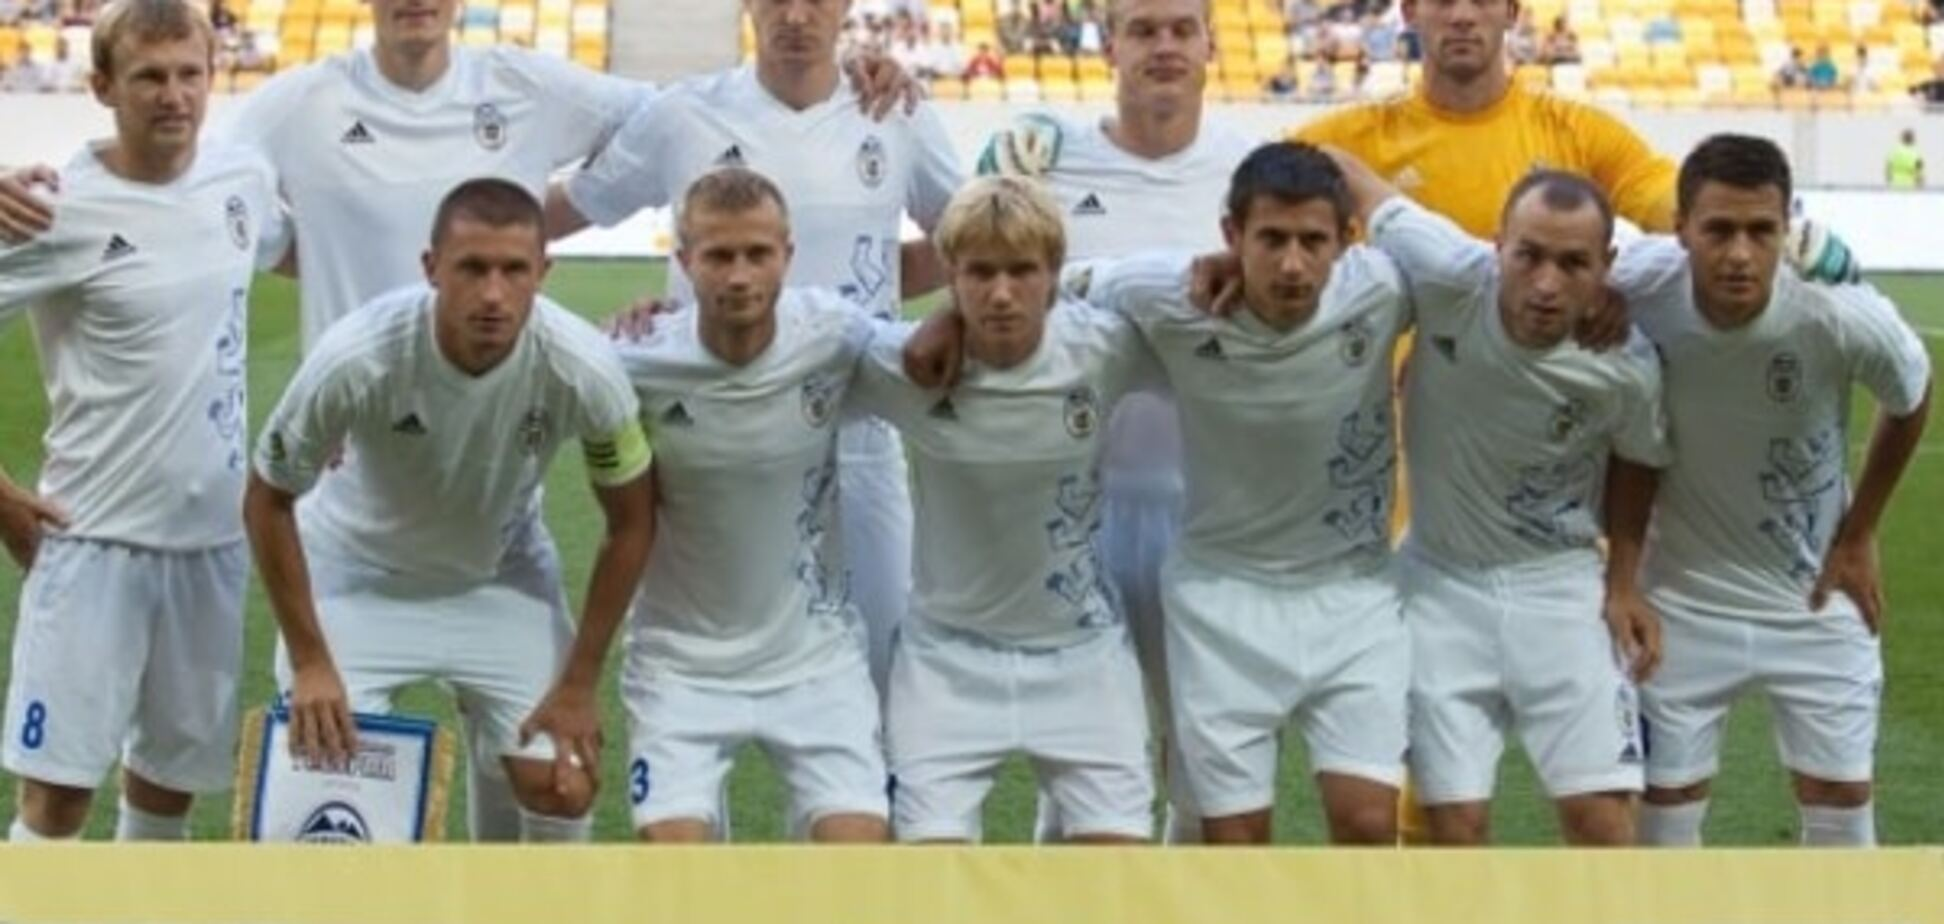 ФИФА жестко наказала клуб Шуфрича